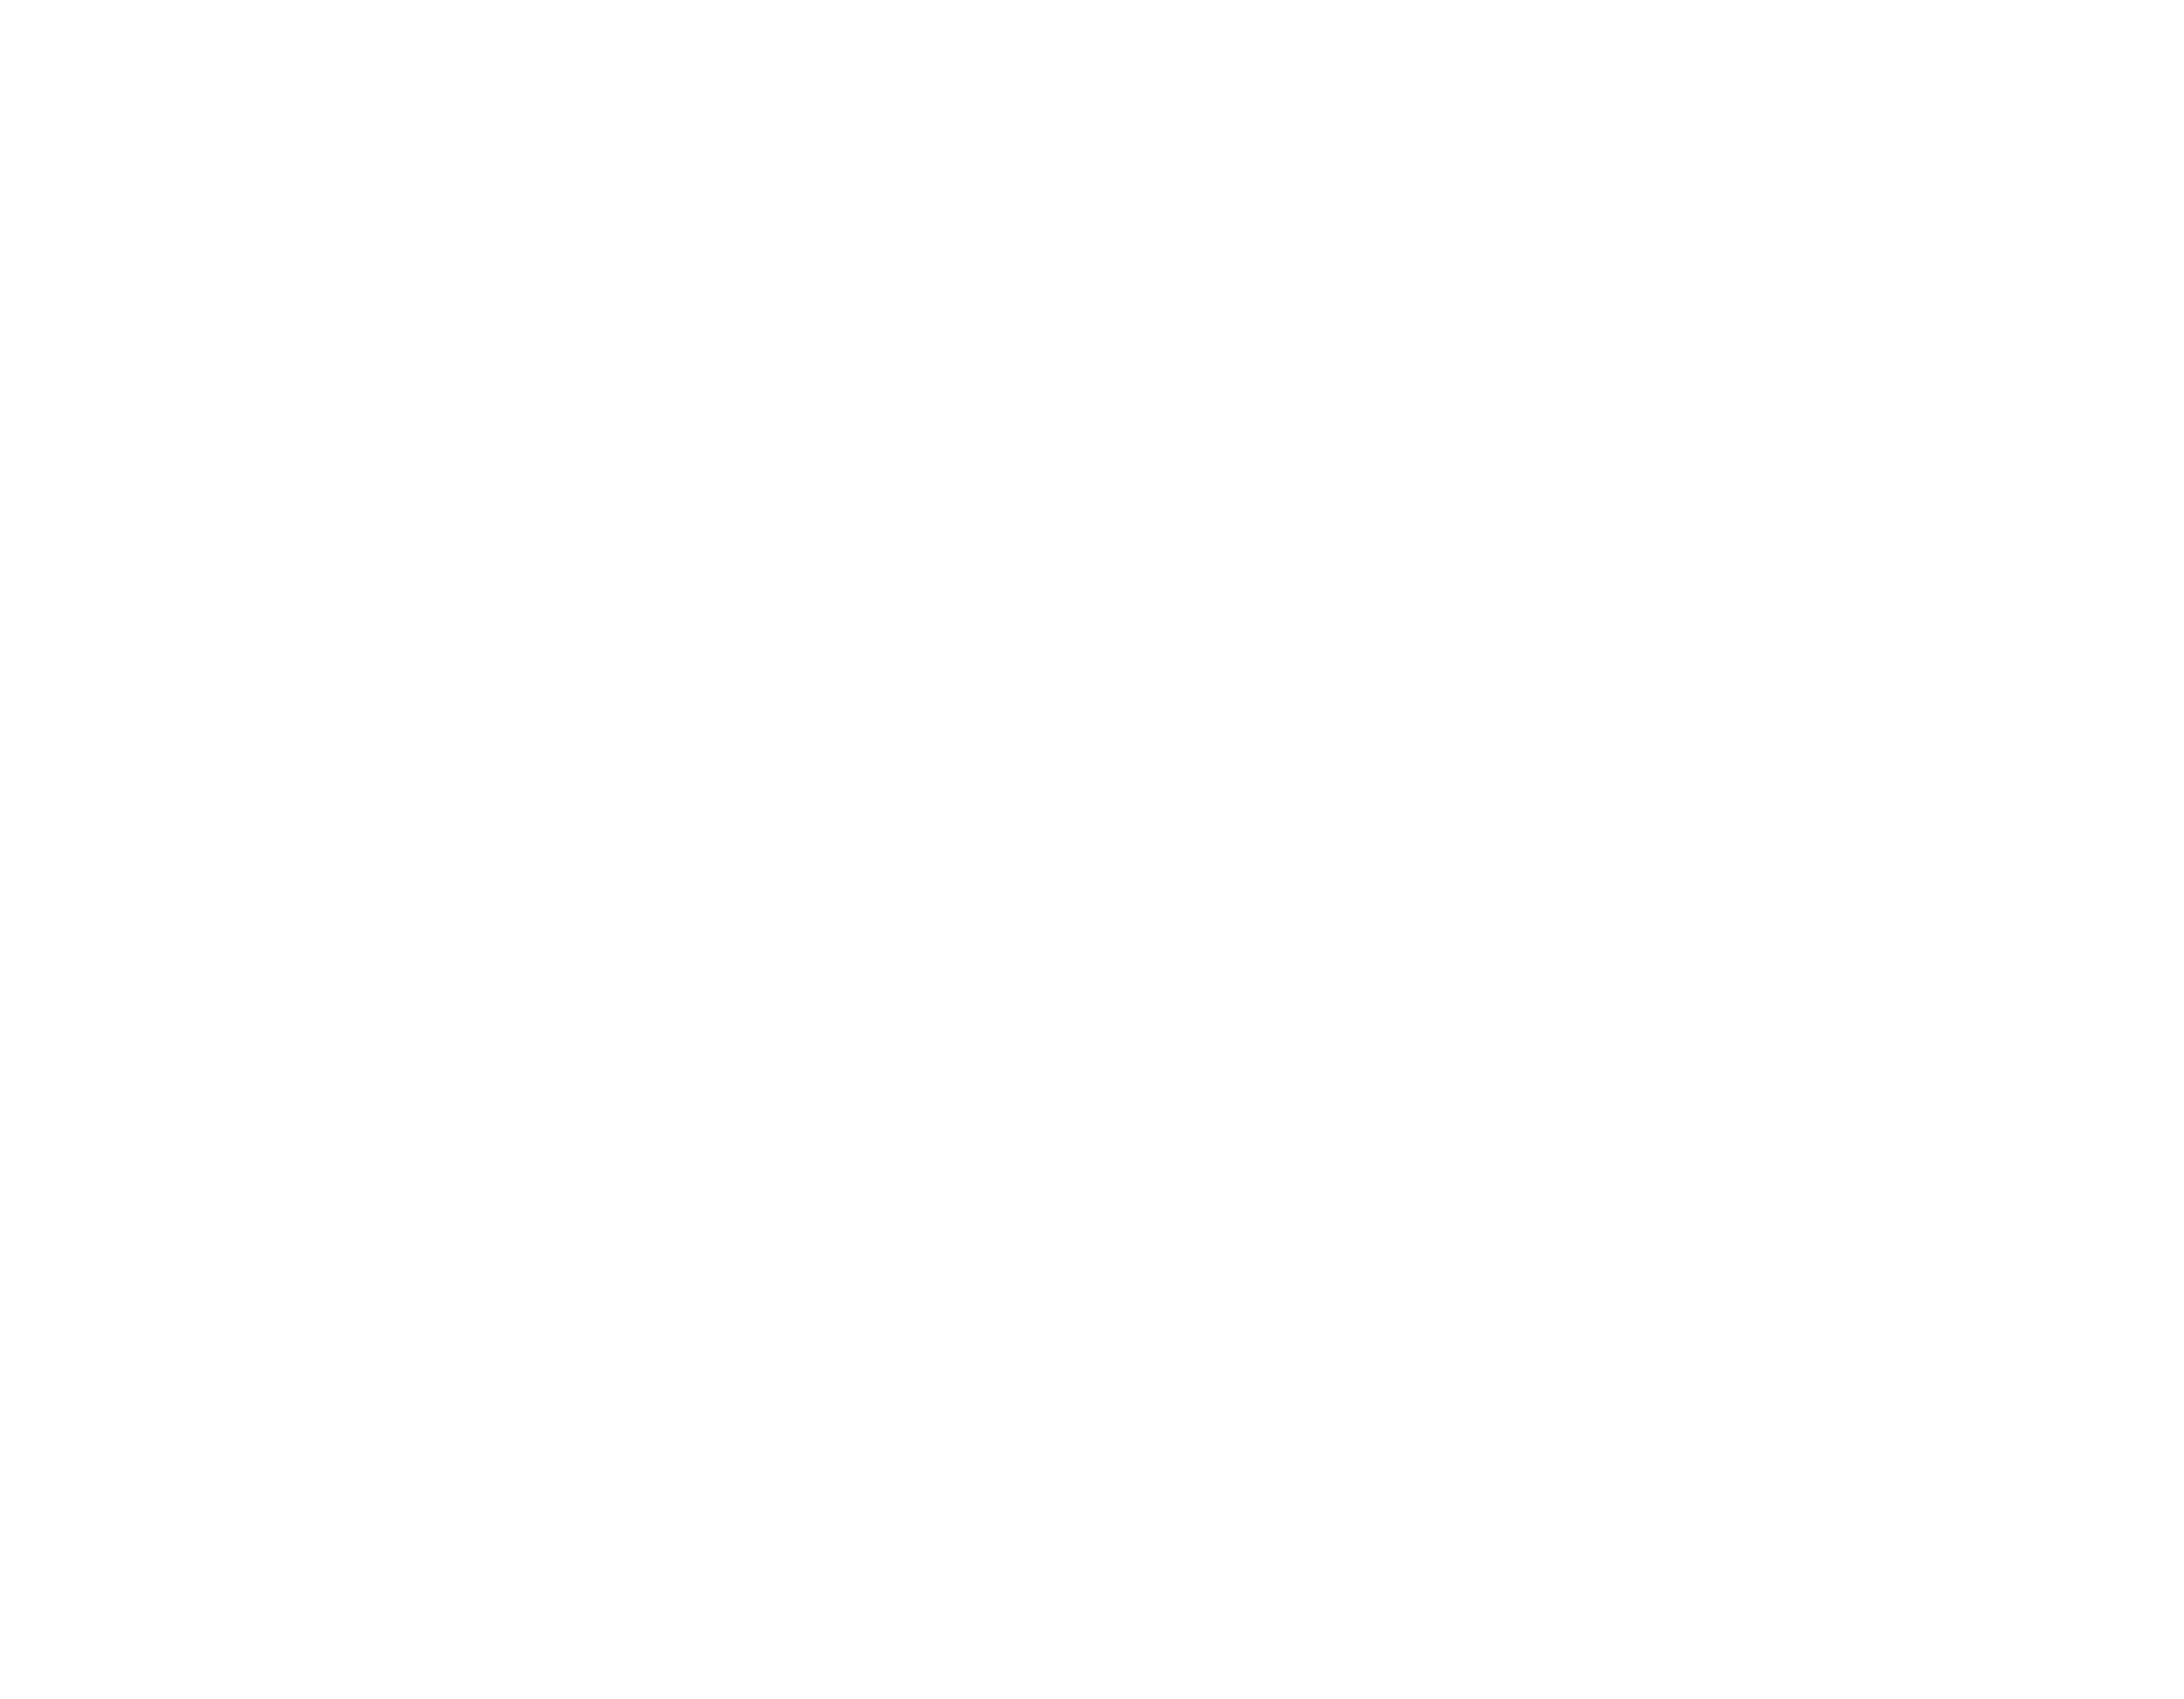 The point restaurant kleinbettingen acca insurance free betting